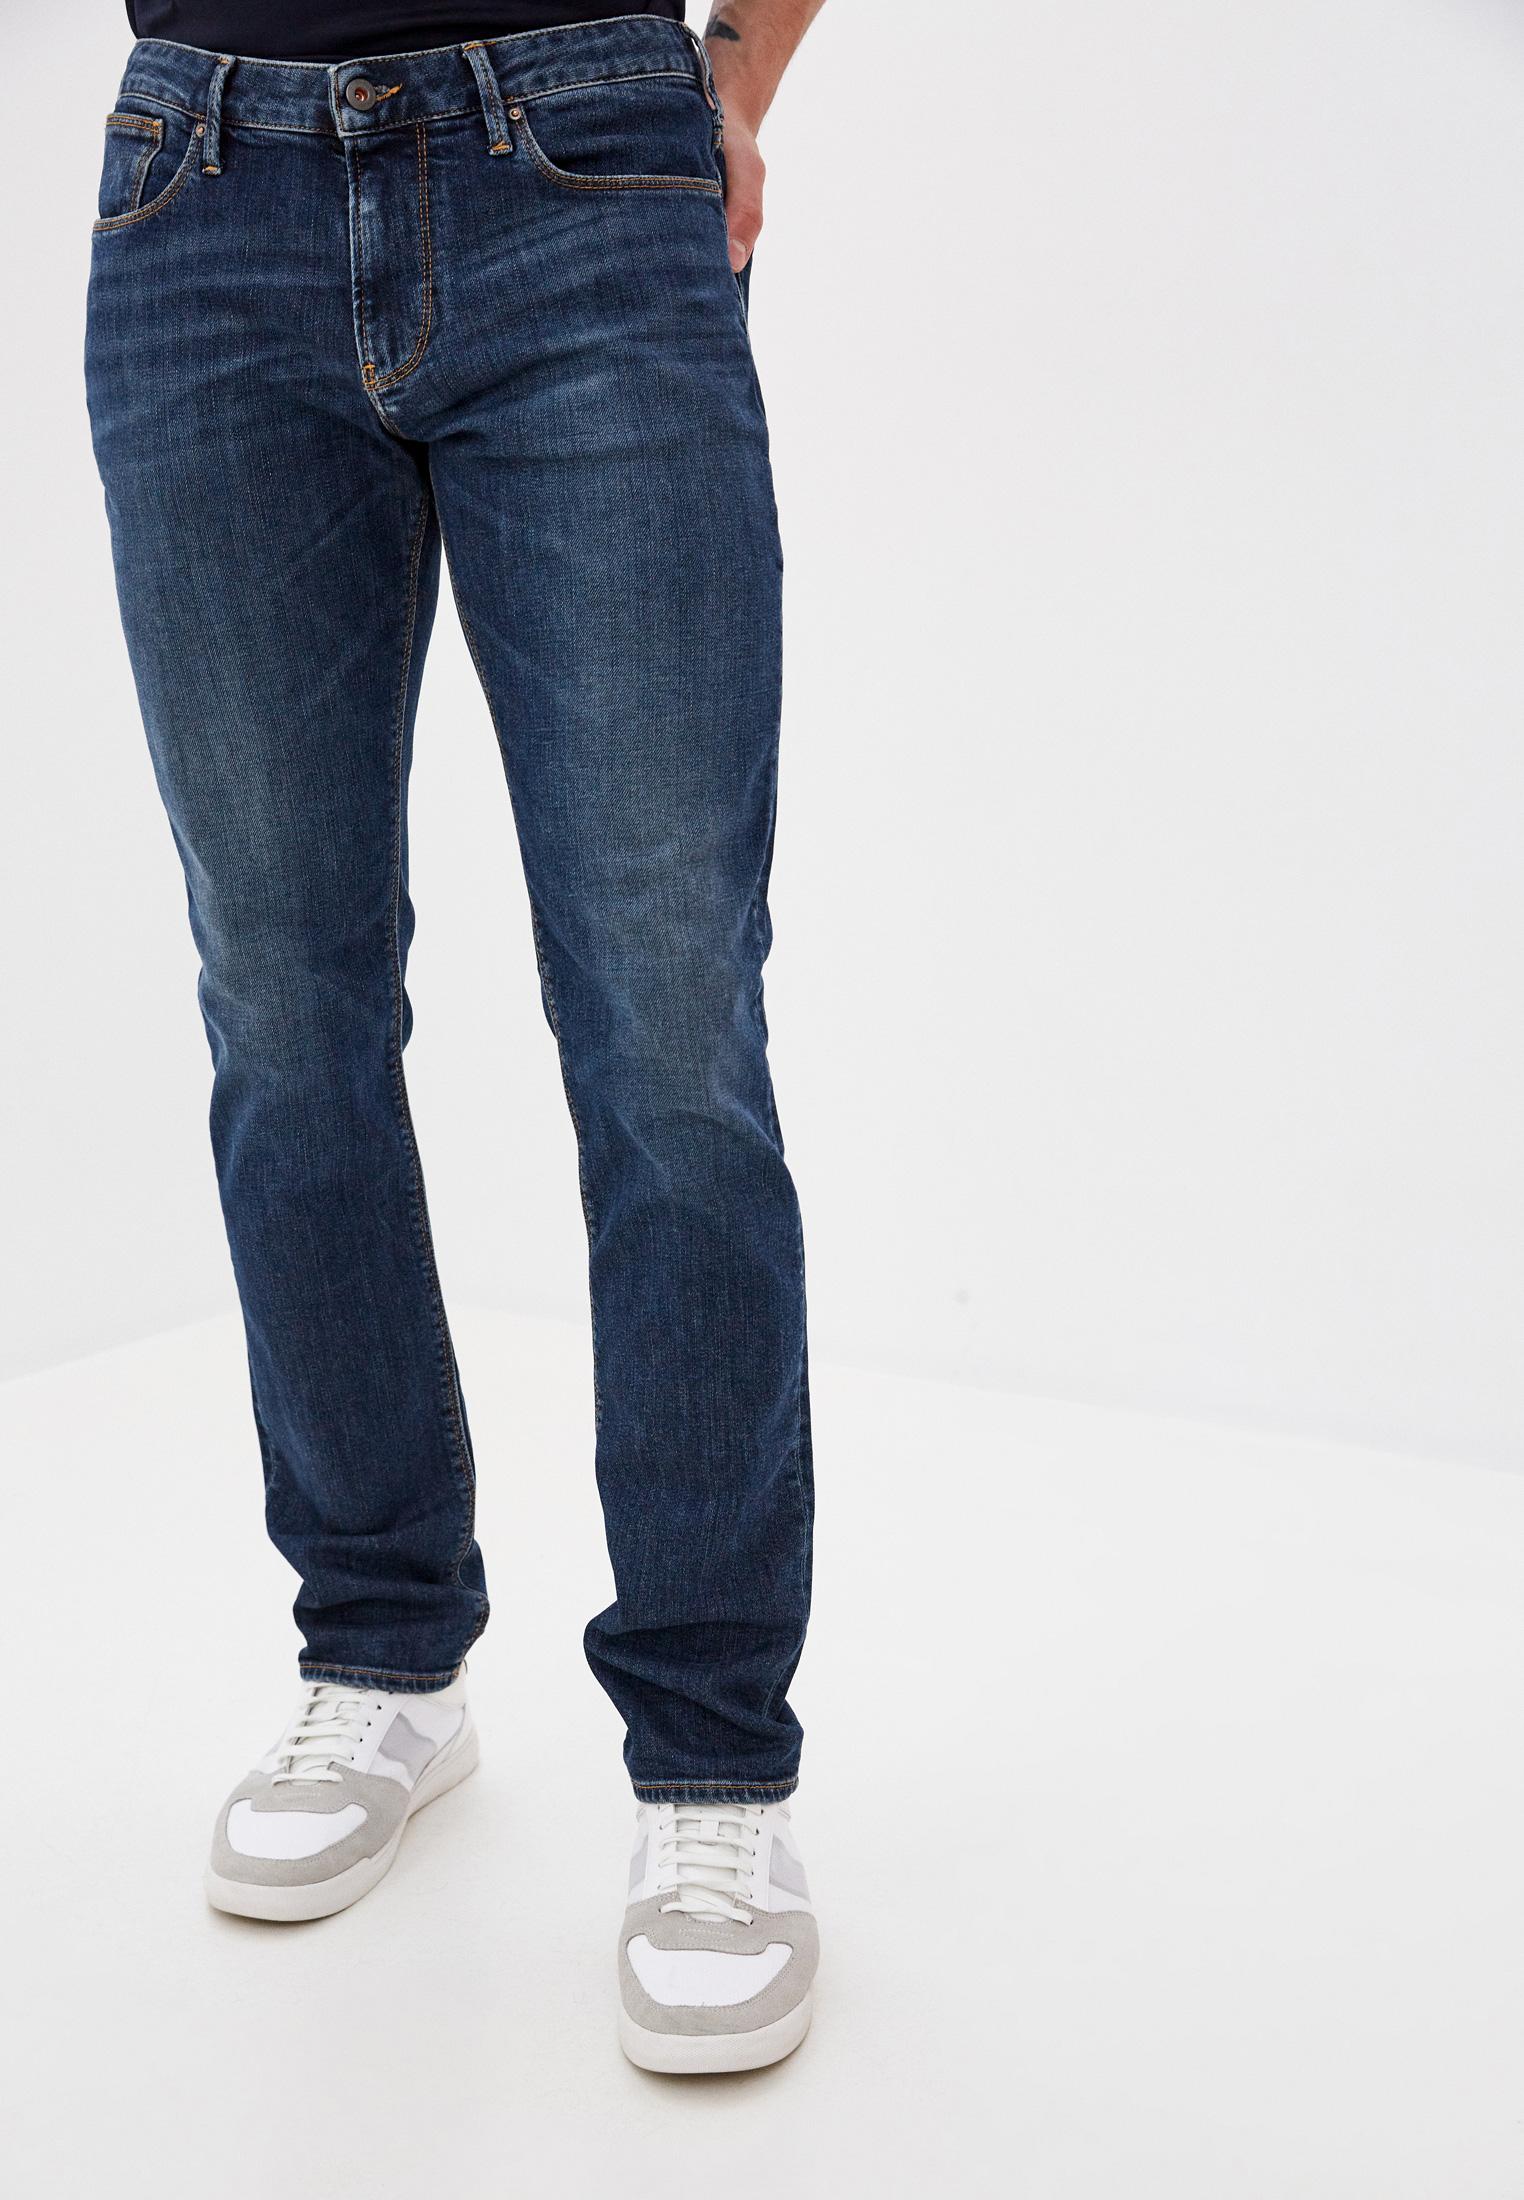 Зауженные джинсы Emporio Armani 8n1j06 1fz4z